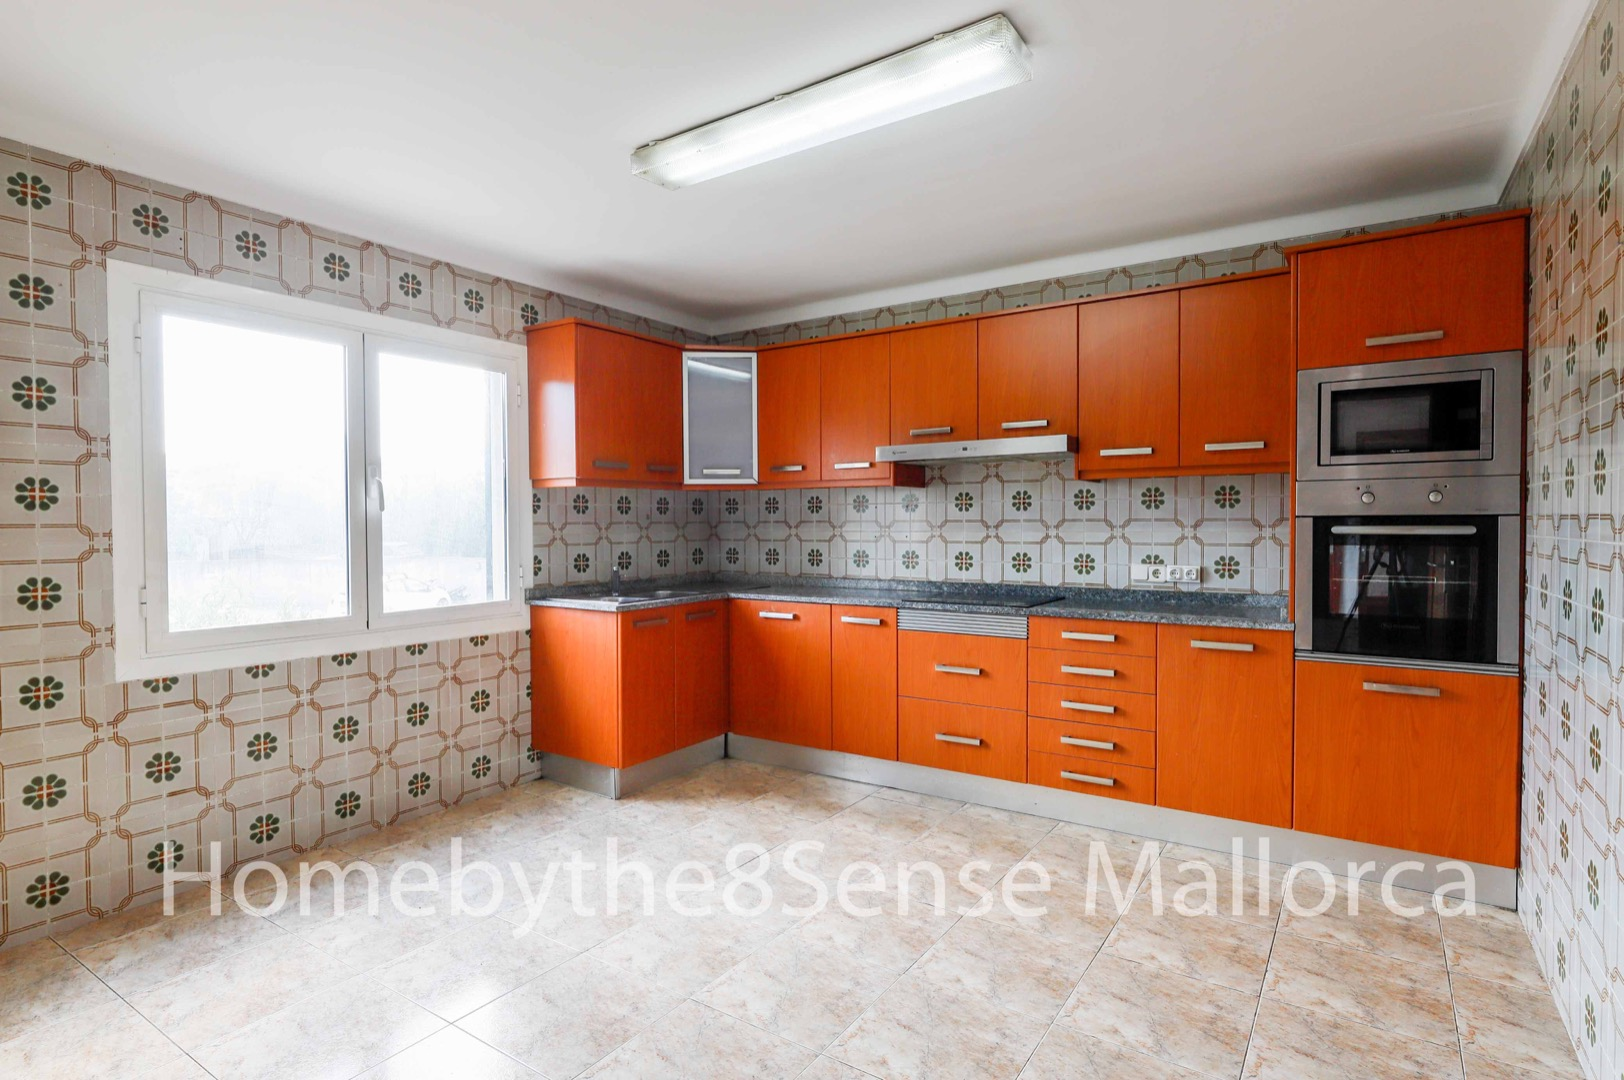 Affitto Appartamento  Marratxí. Inmobiliaria home by the8sense ofrece en alquiler muy grande pis